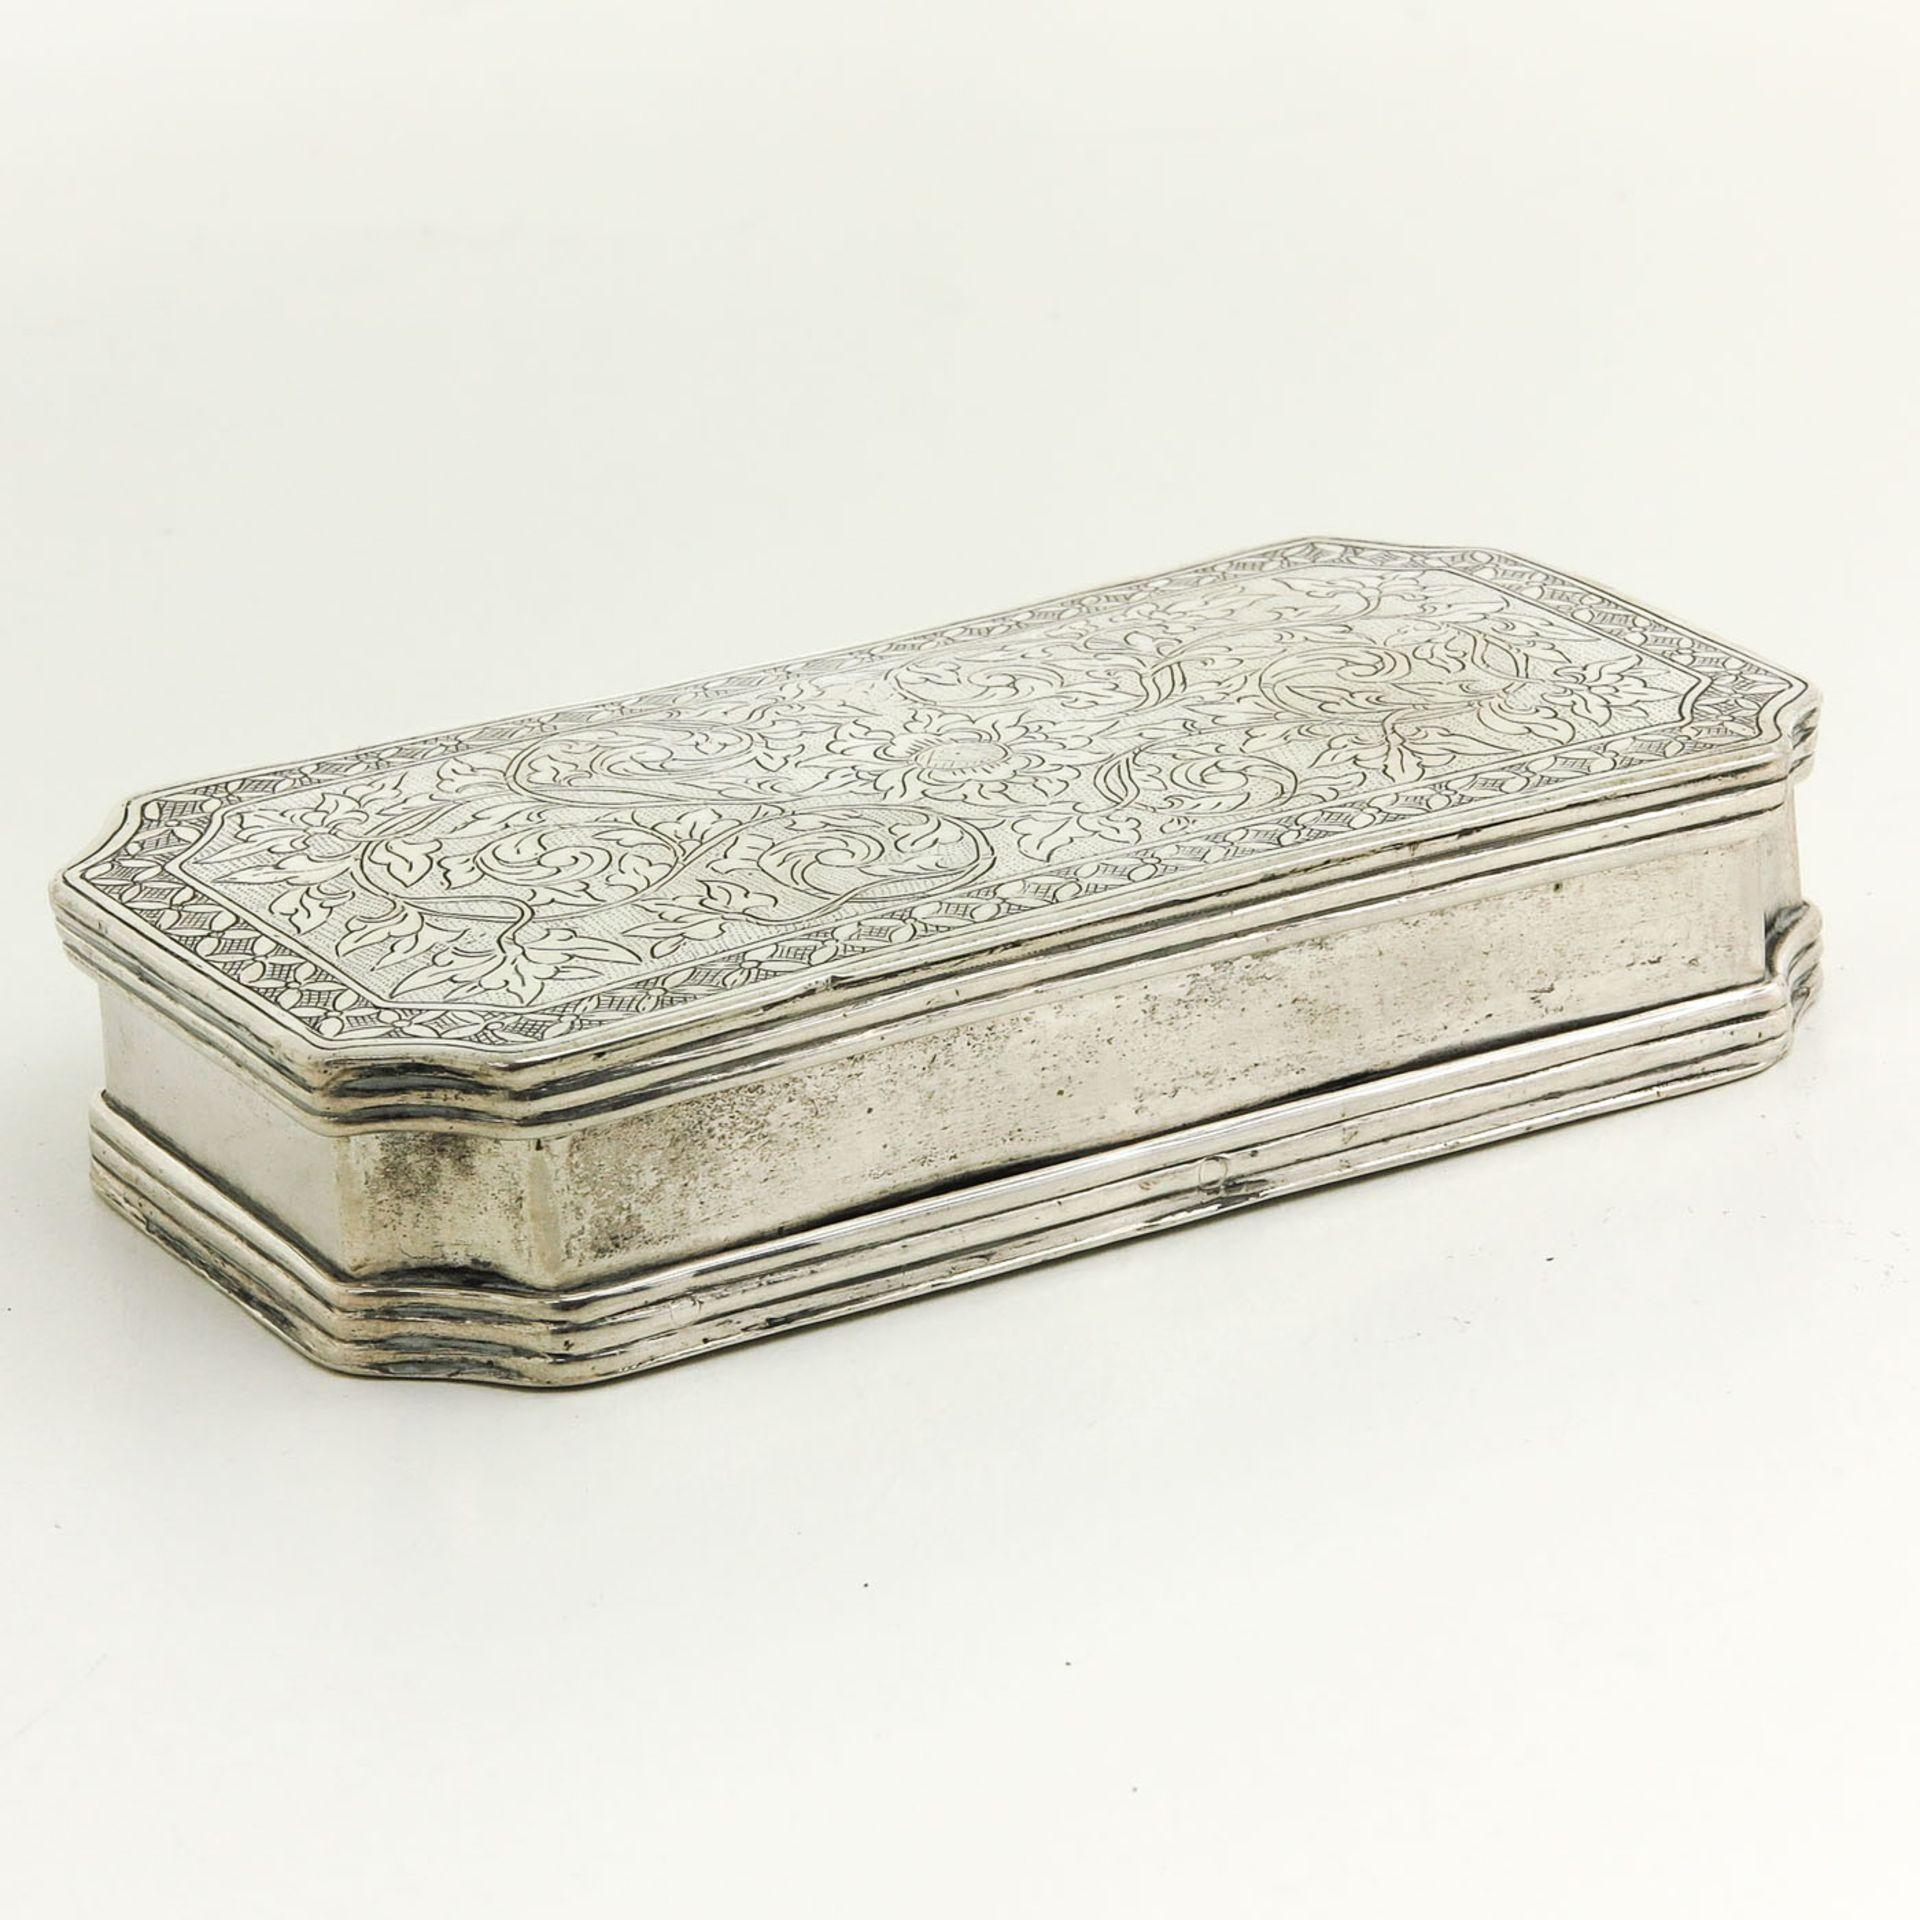 Los 3225 - An 18th Century Snuff Box